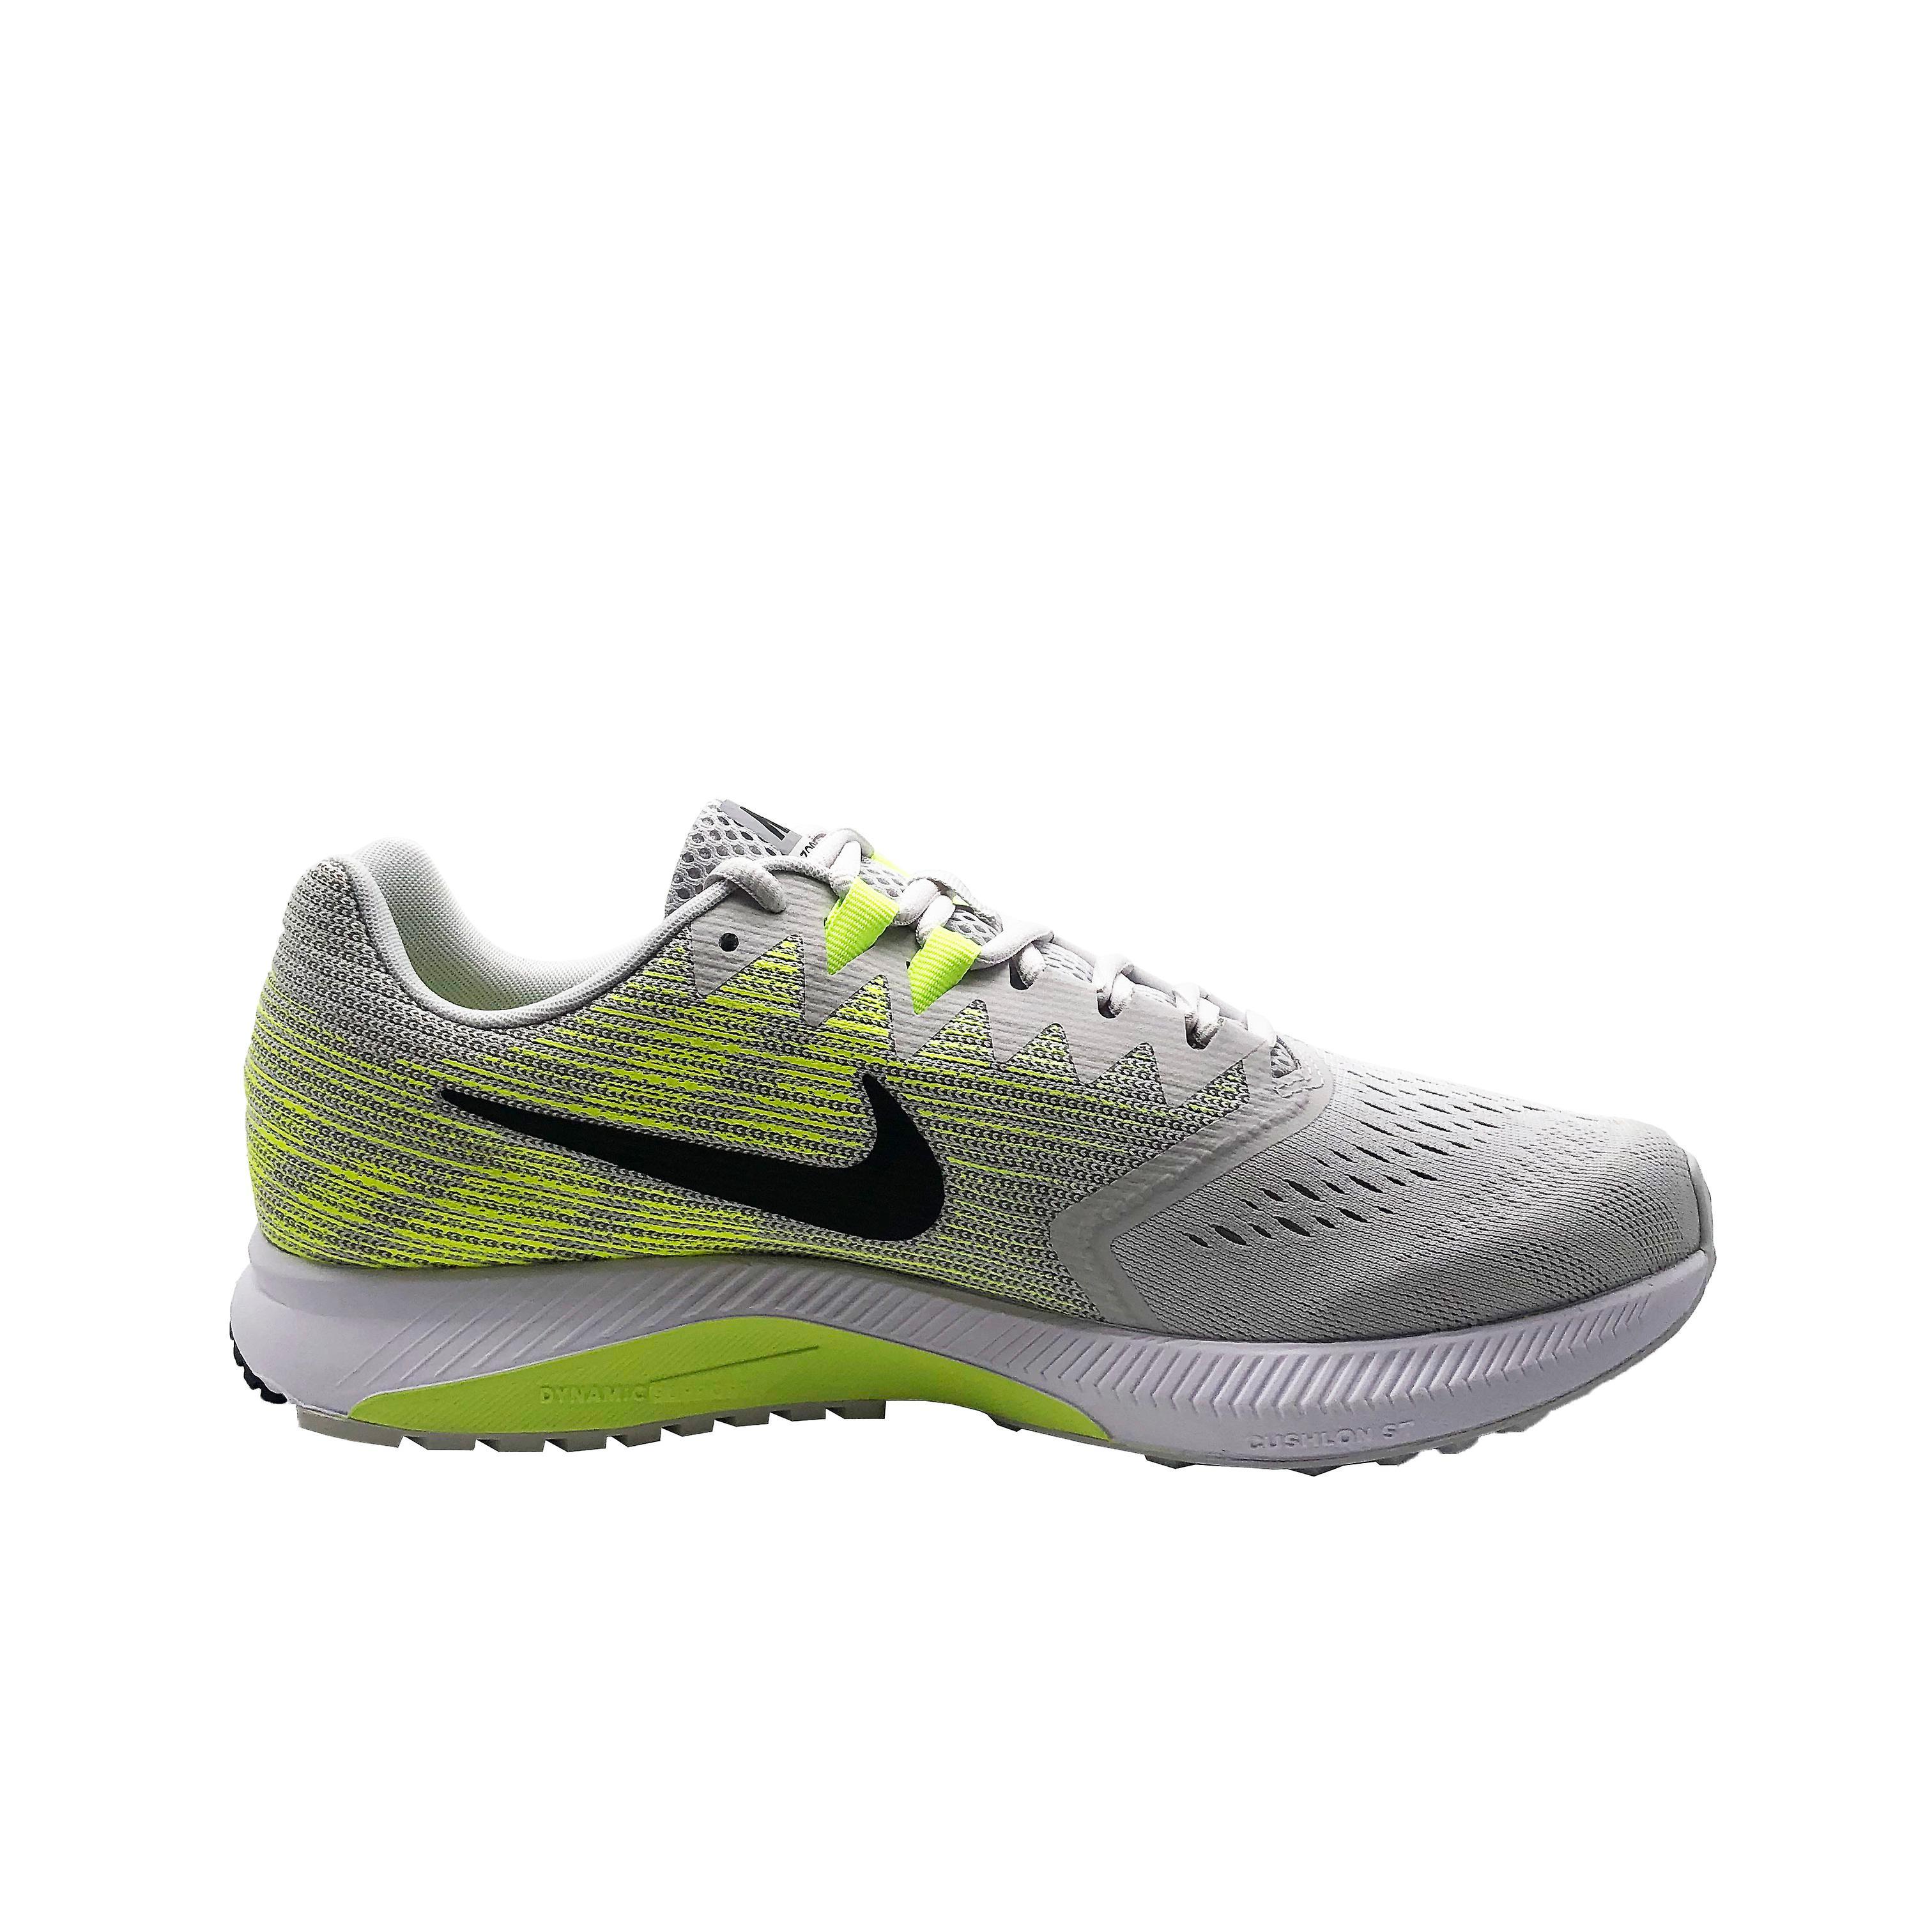 Nike Zoom span 2 908990 010 Mens utbildare